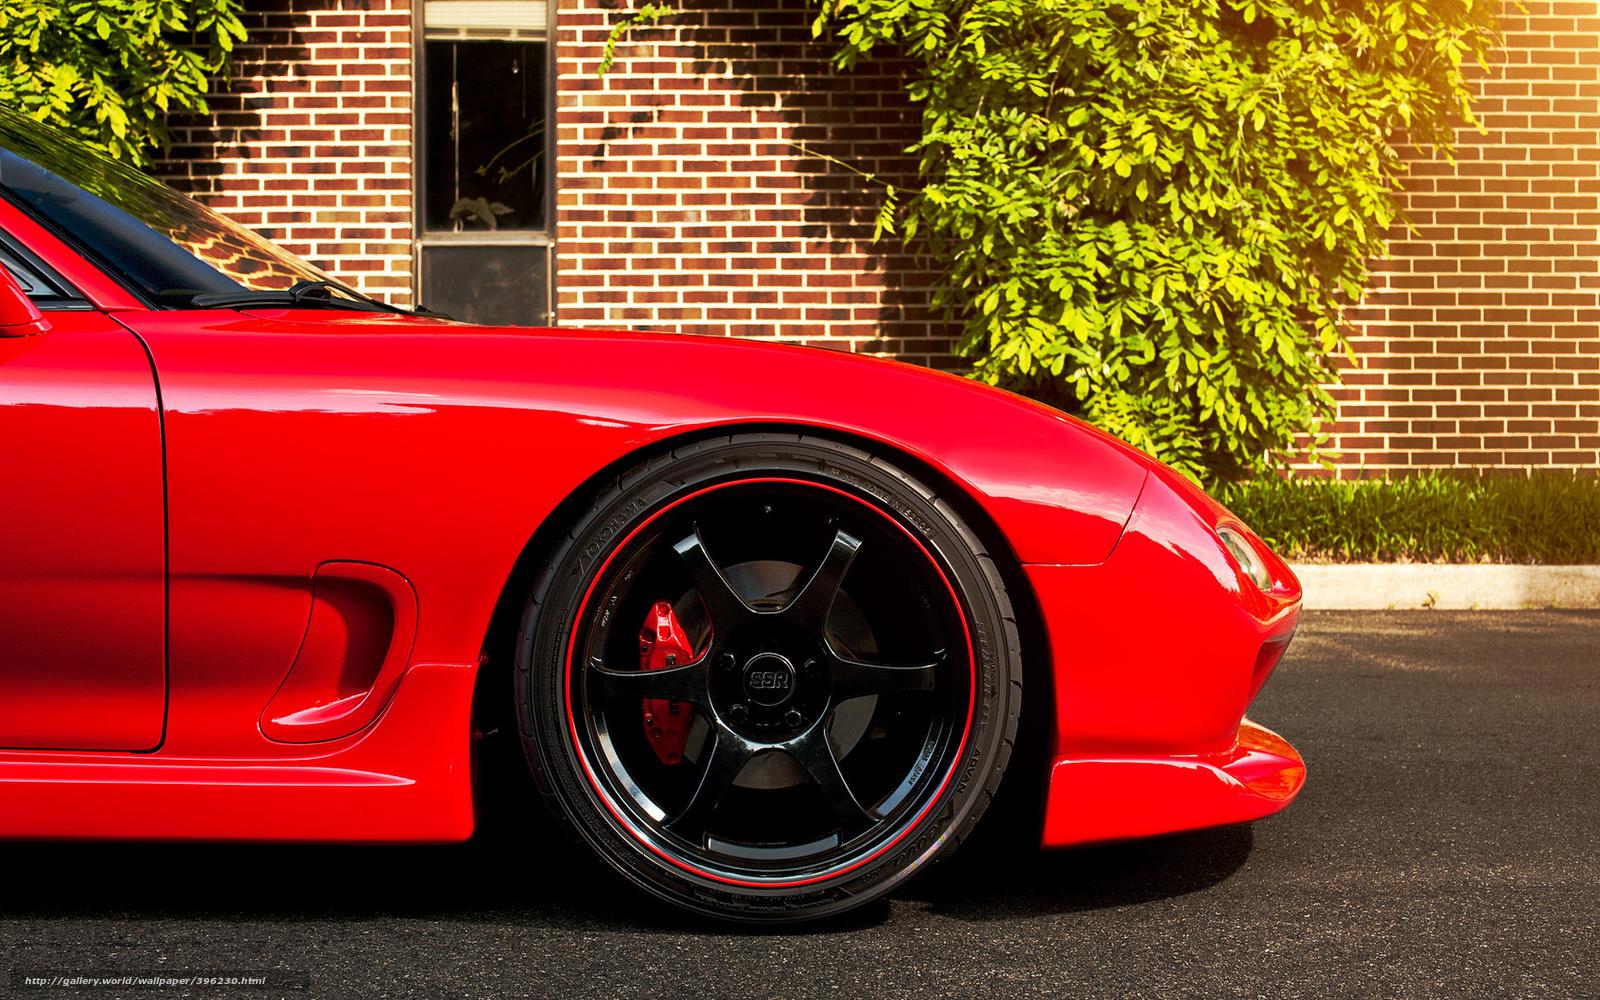 Download Wallpaper Mazda Red Tire Disk Brick Wall Free